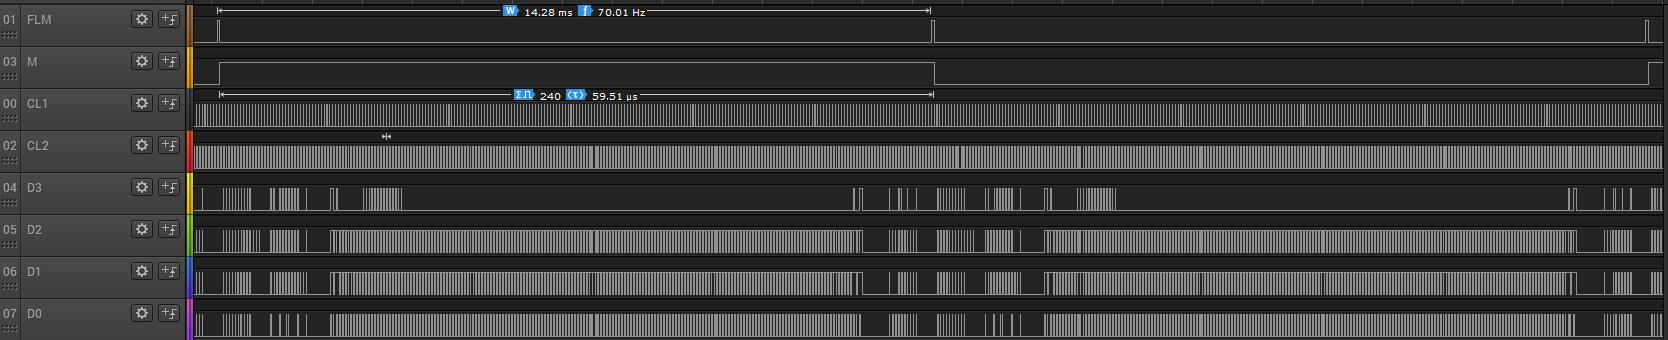 Управление ЖК-матрицей F-51543NFU-LW-ADN - PWB51543C-2-V0 (от ленточной библиотеки) - 8